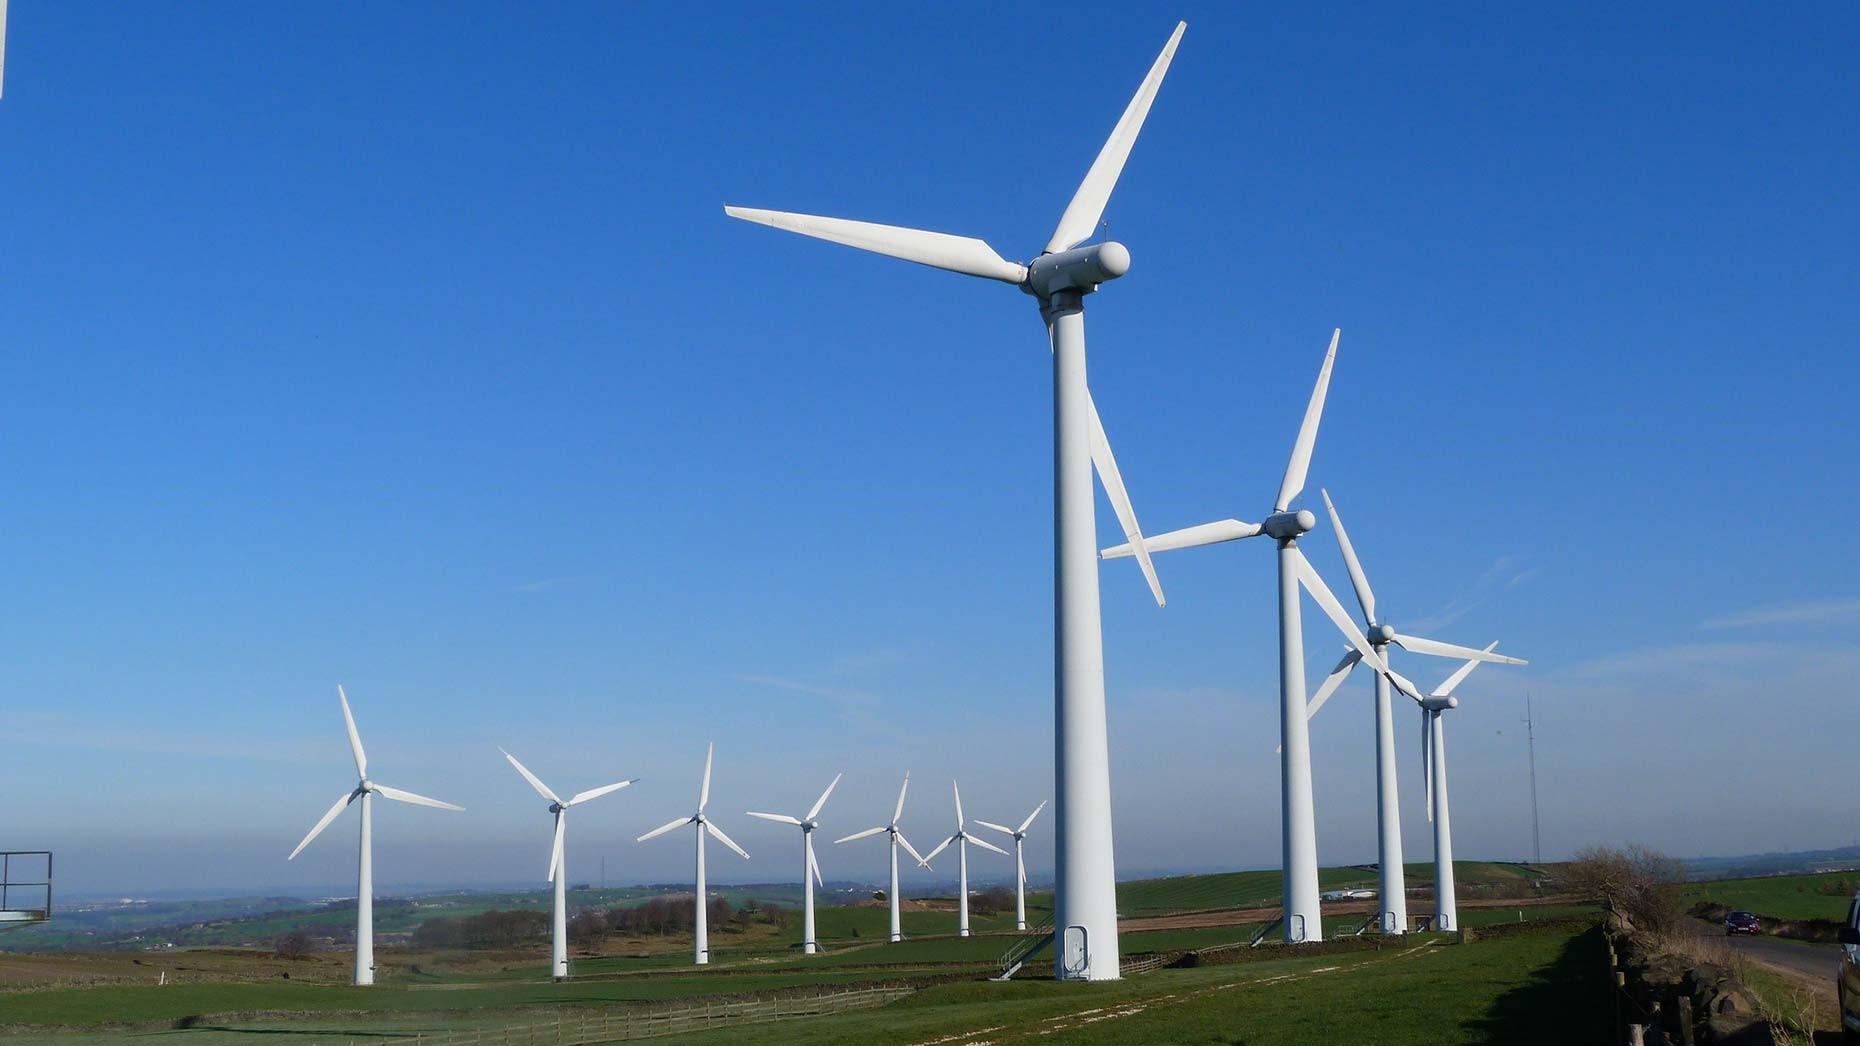 Figure 1 Ngong Hills Wind Farm, courtesy of KenGen